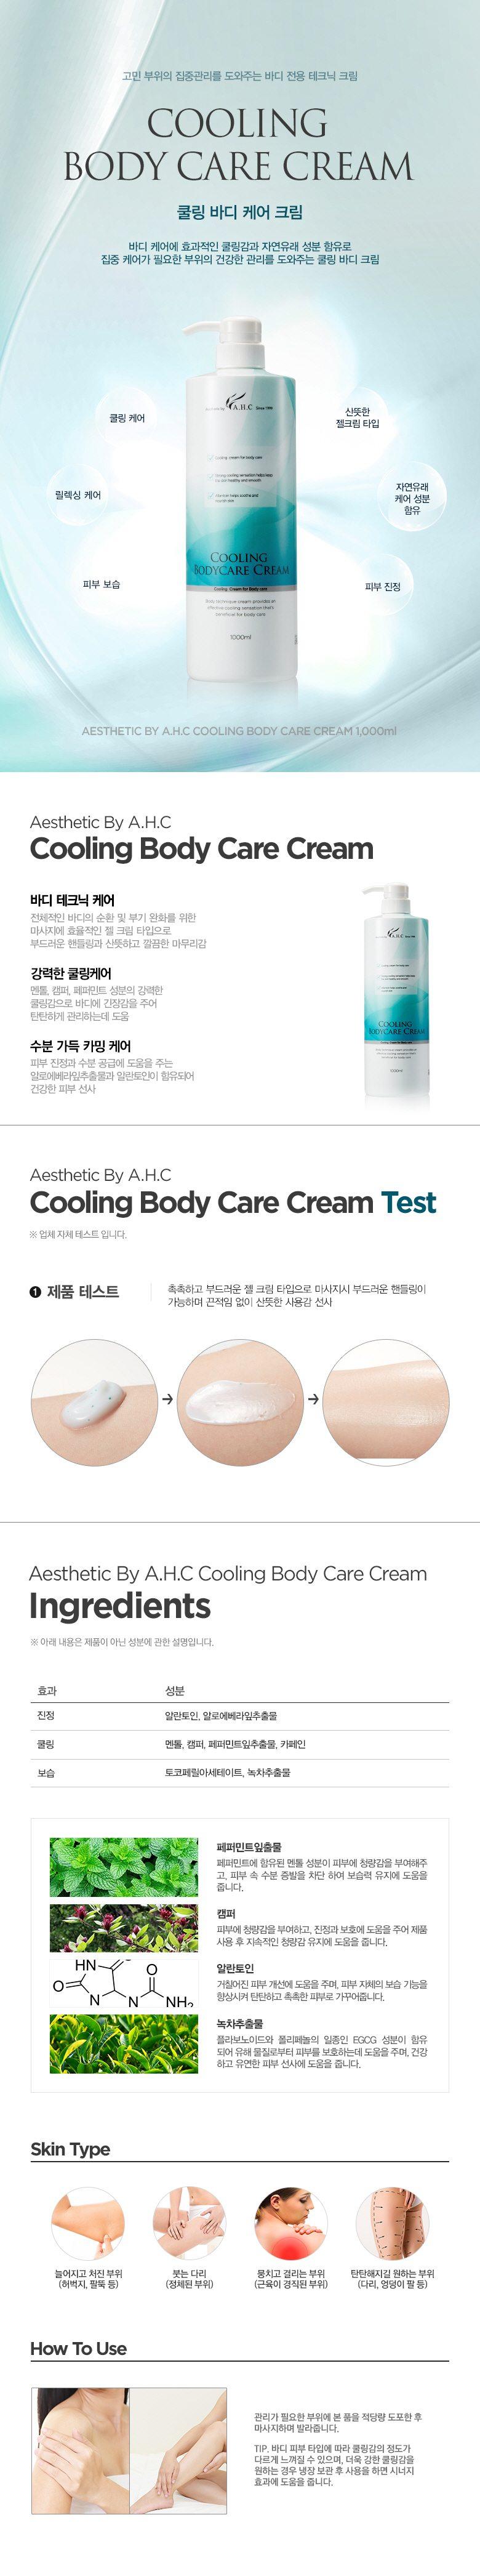 AHC Cooling Body Care Cream 1000ml malaysia singapore indonesia